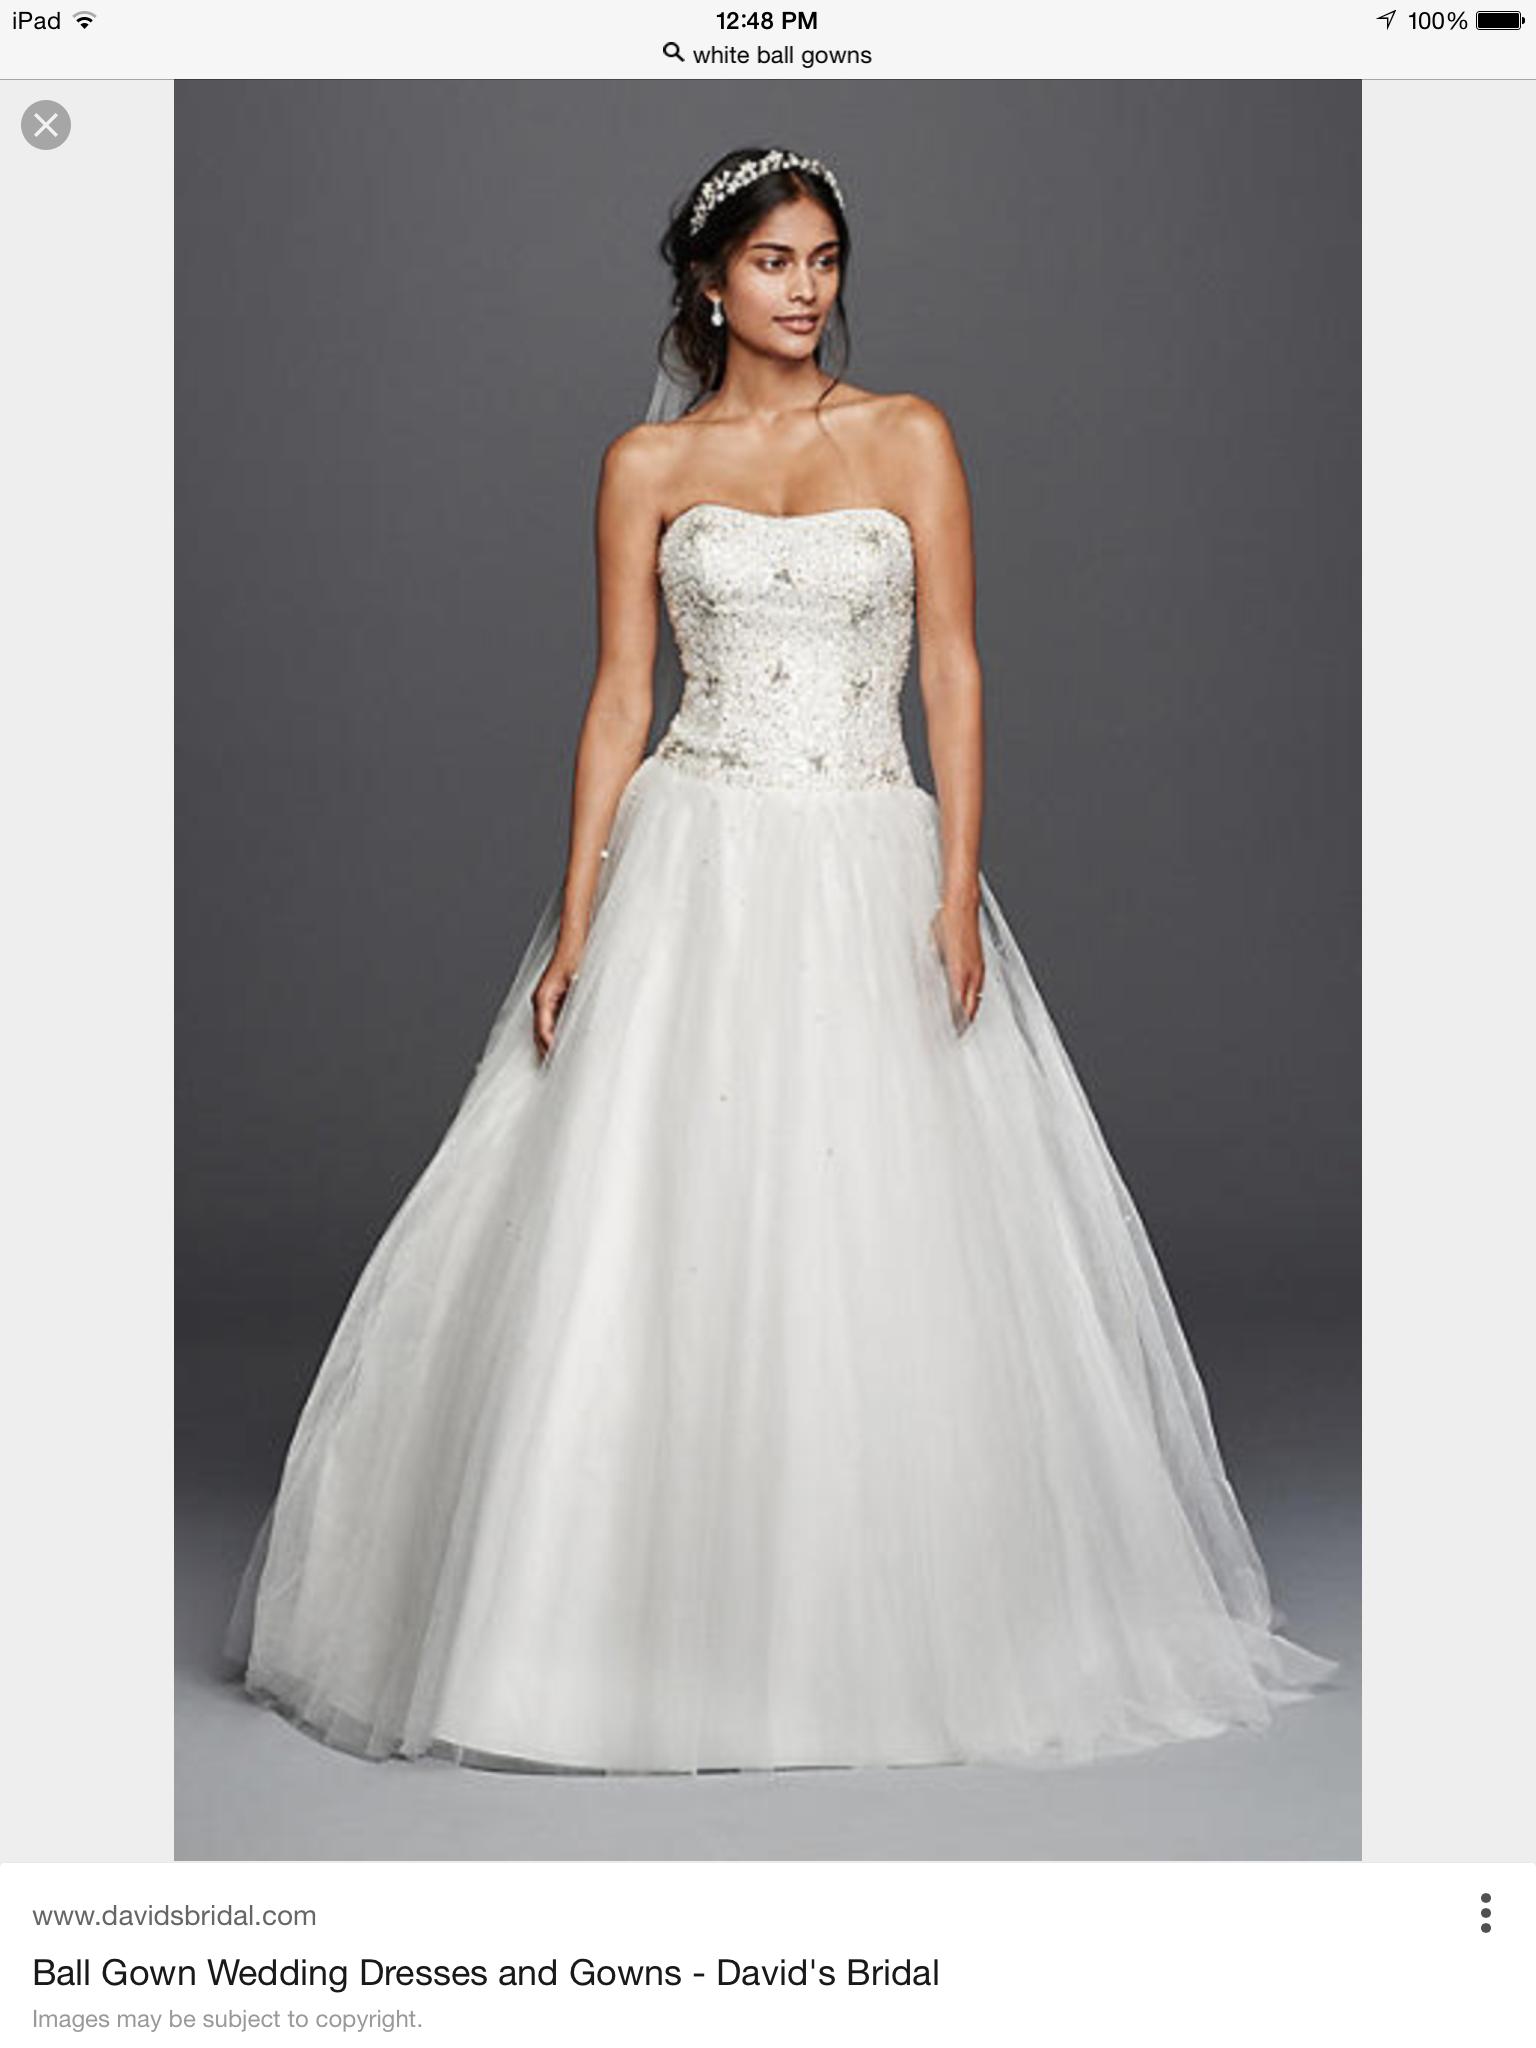 White quinceanera dress at David\'s Bridal | Quinceañera | Pinterest ...